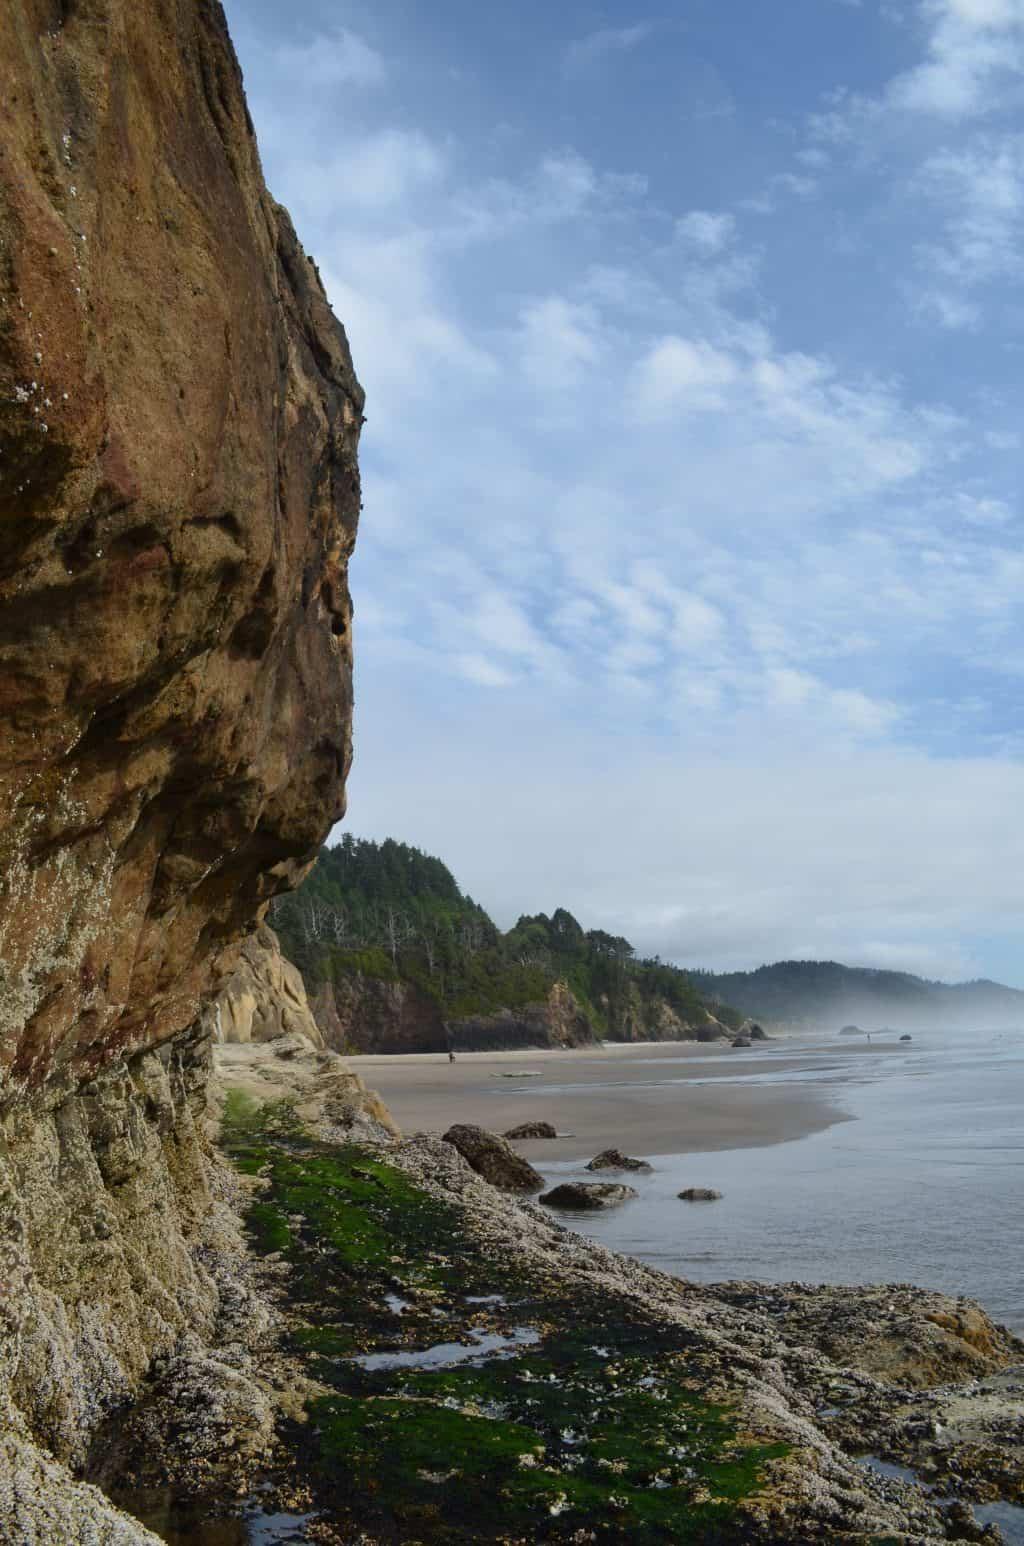 Hug Pointe State Park Oregon coast beach